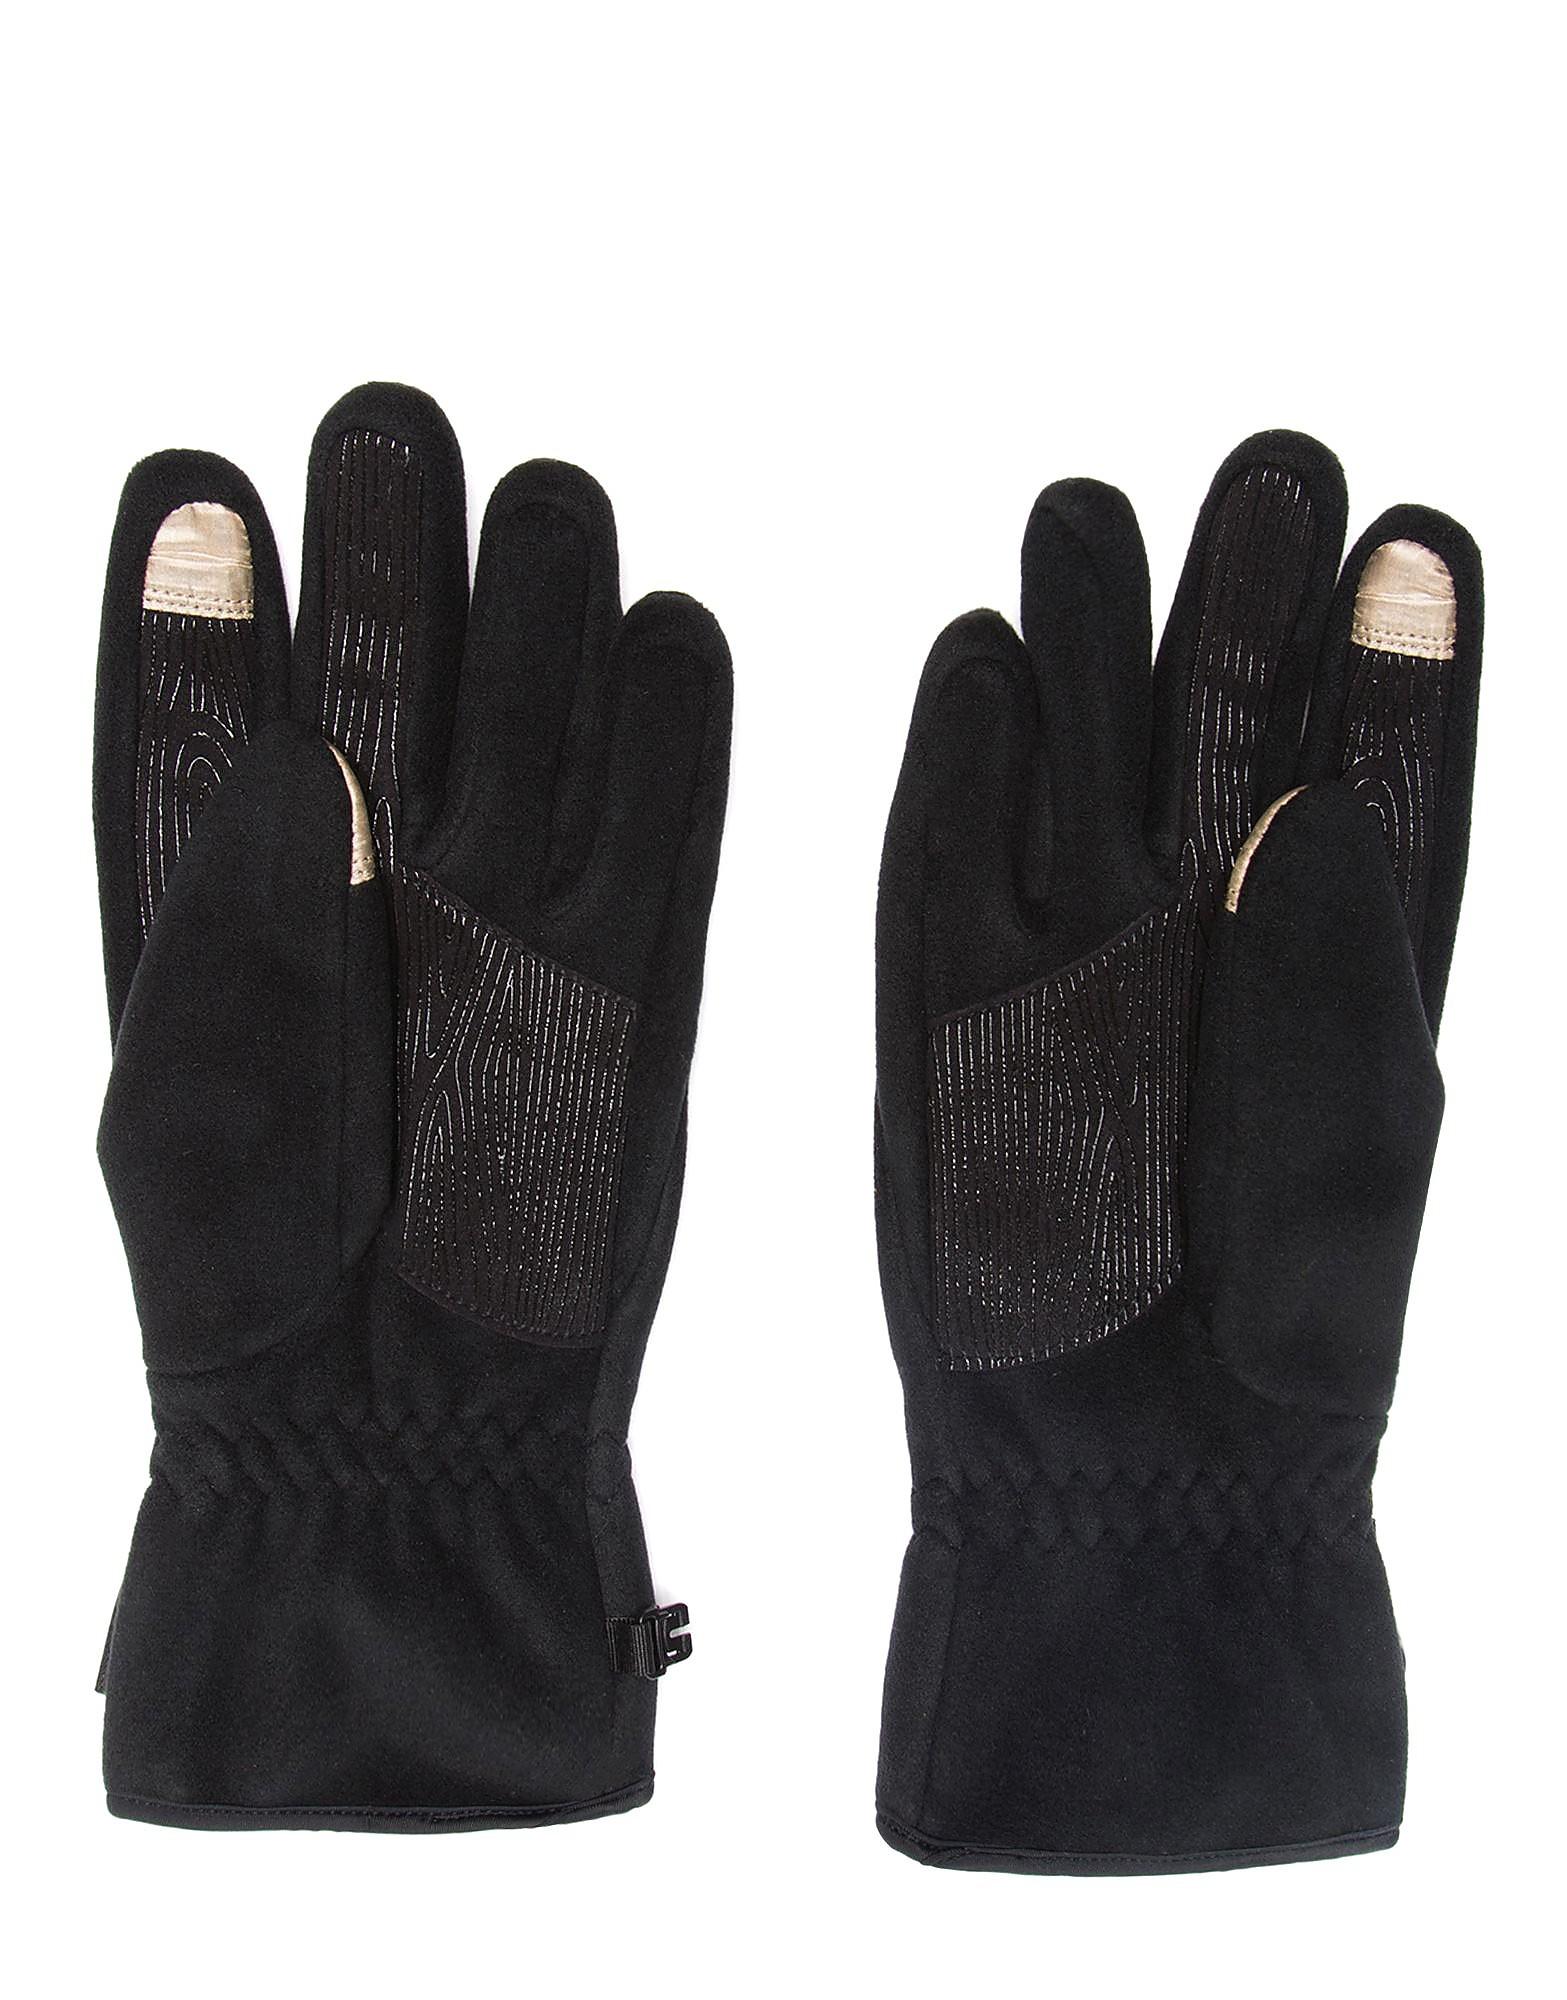 The North Face Pamir Windstopper E-Tip Gloves